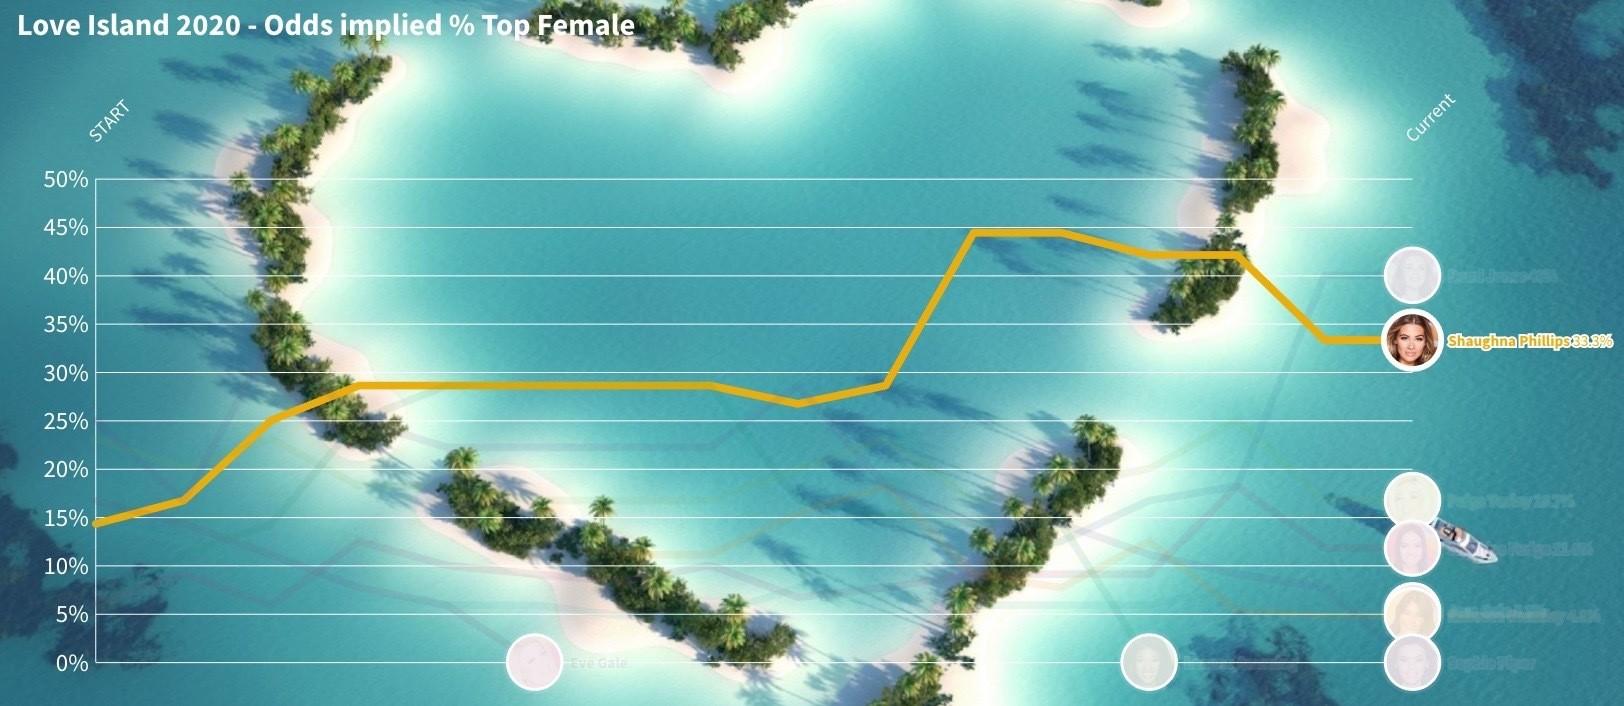 Love island odds